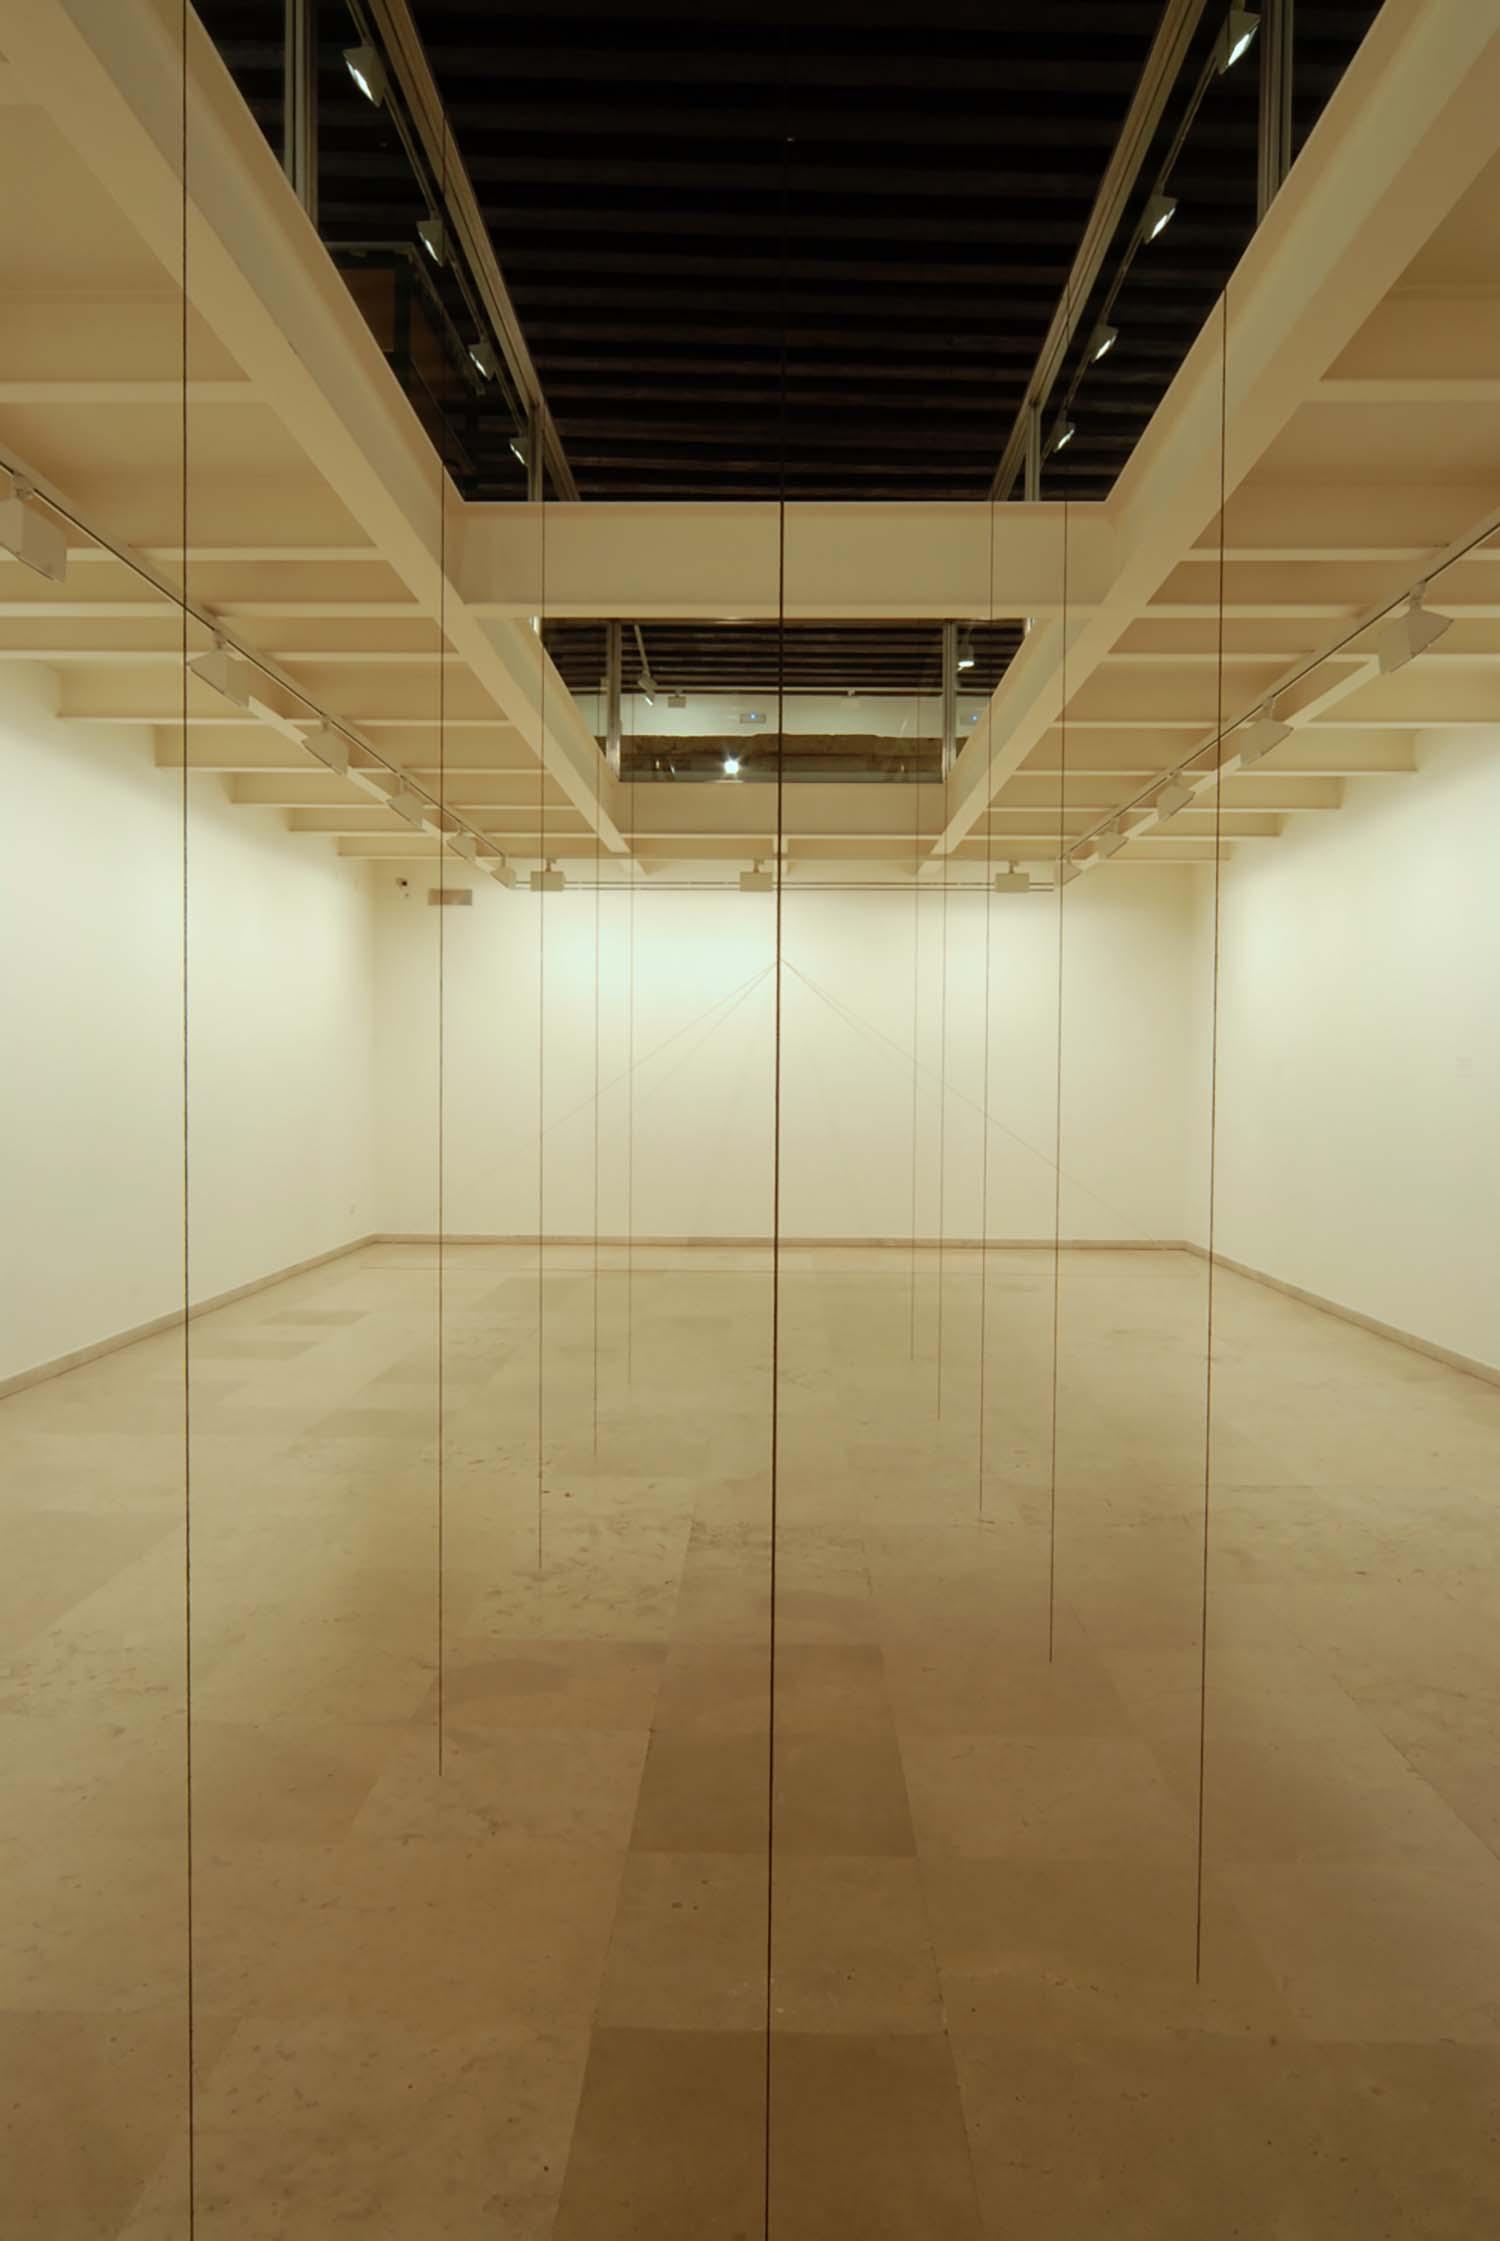 Museo de Arte Contemporaneo Esteban Vicente, <br/>Segovia, Spain,